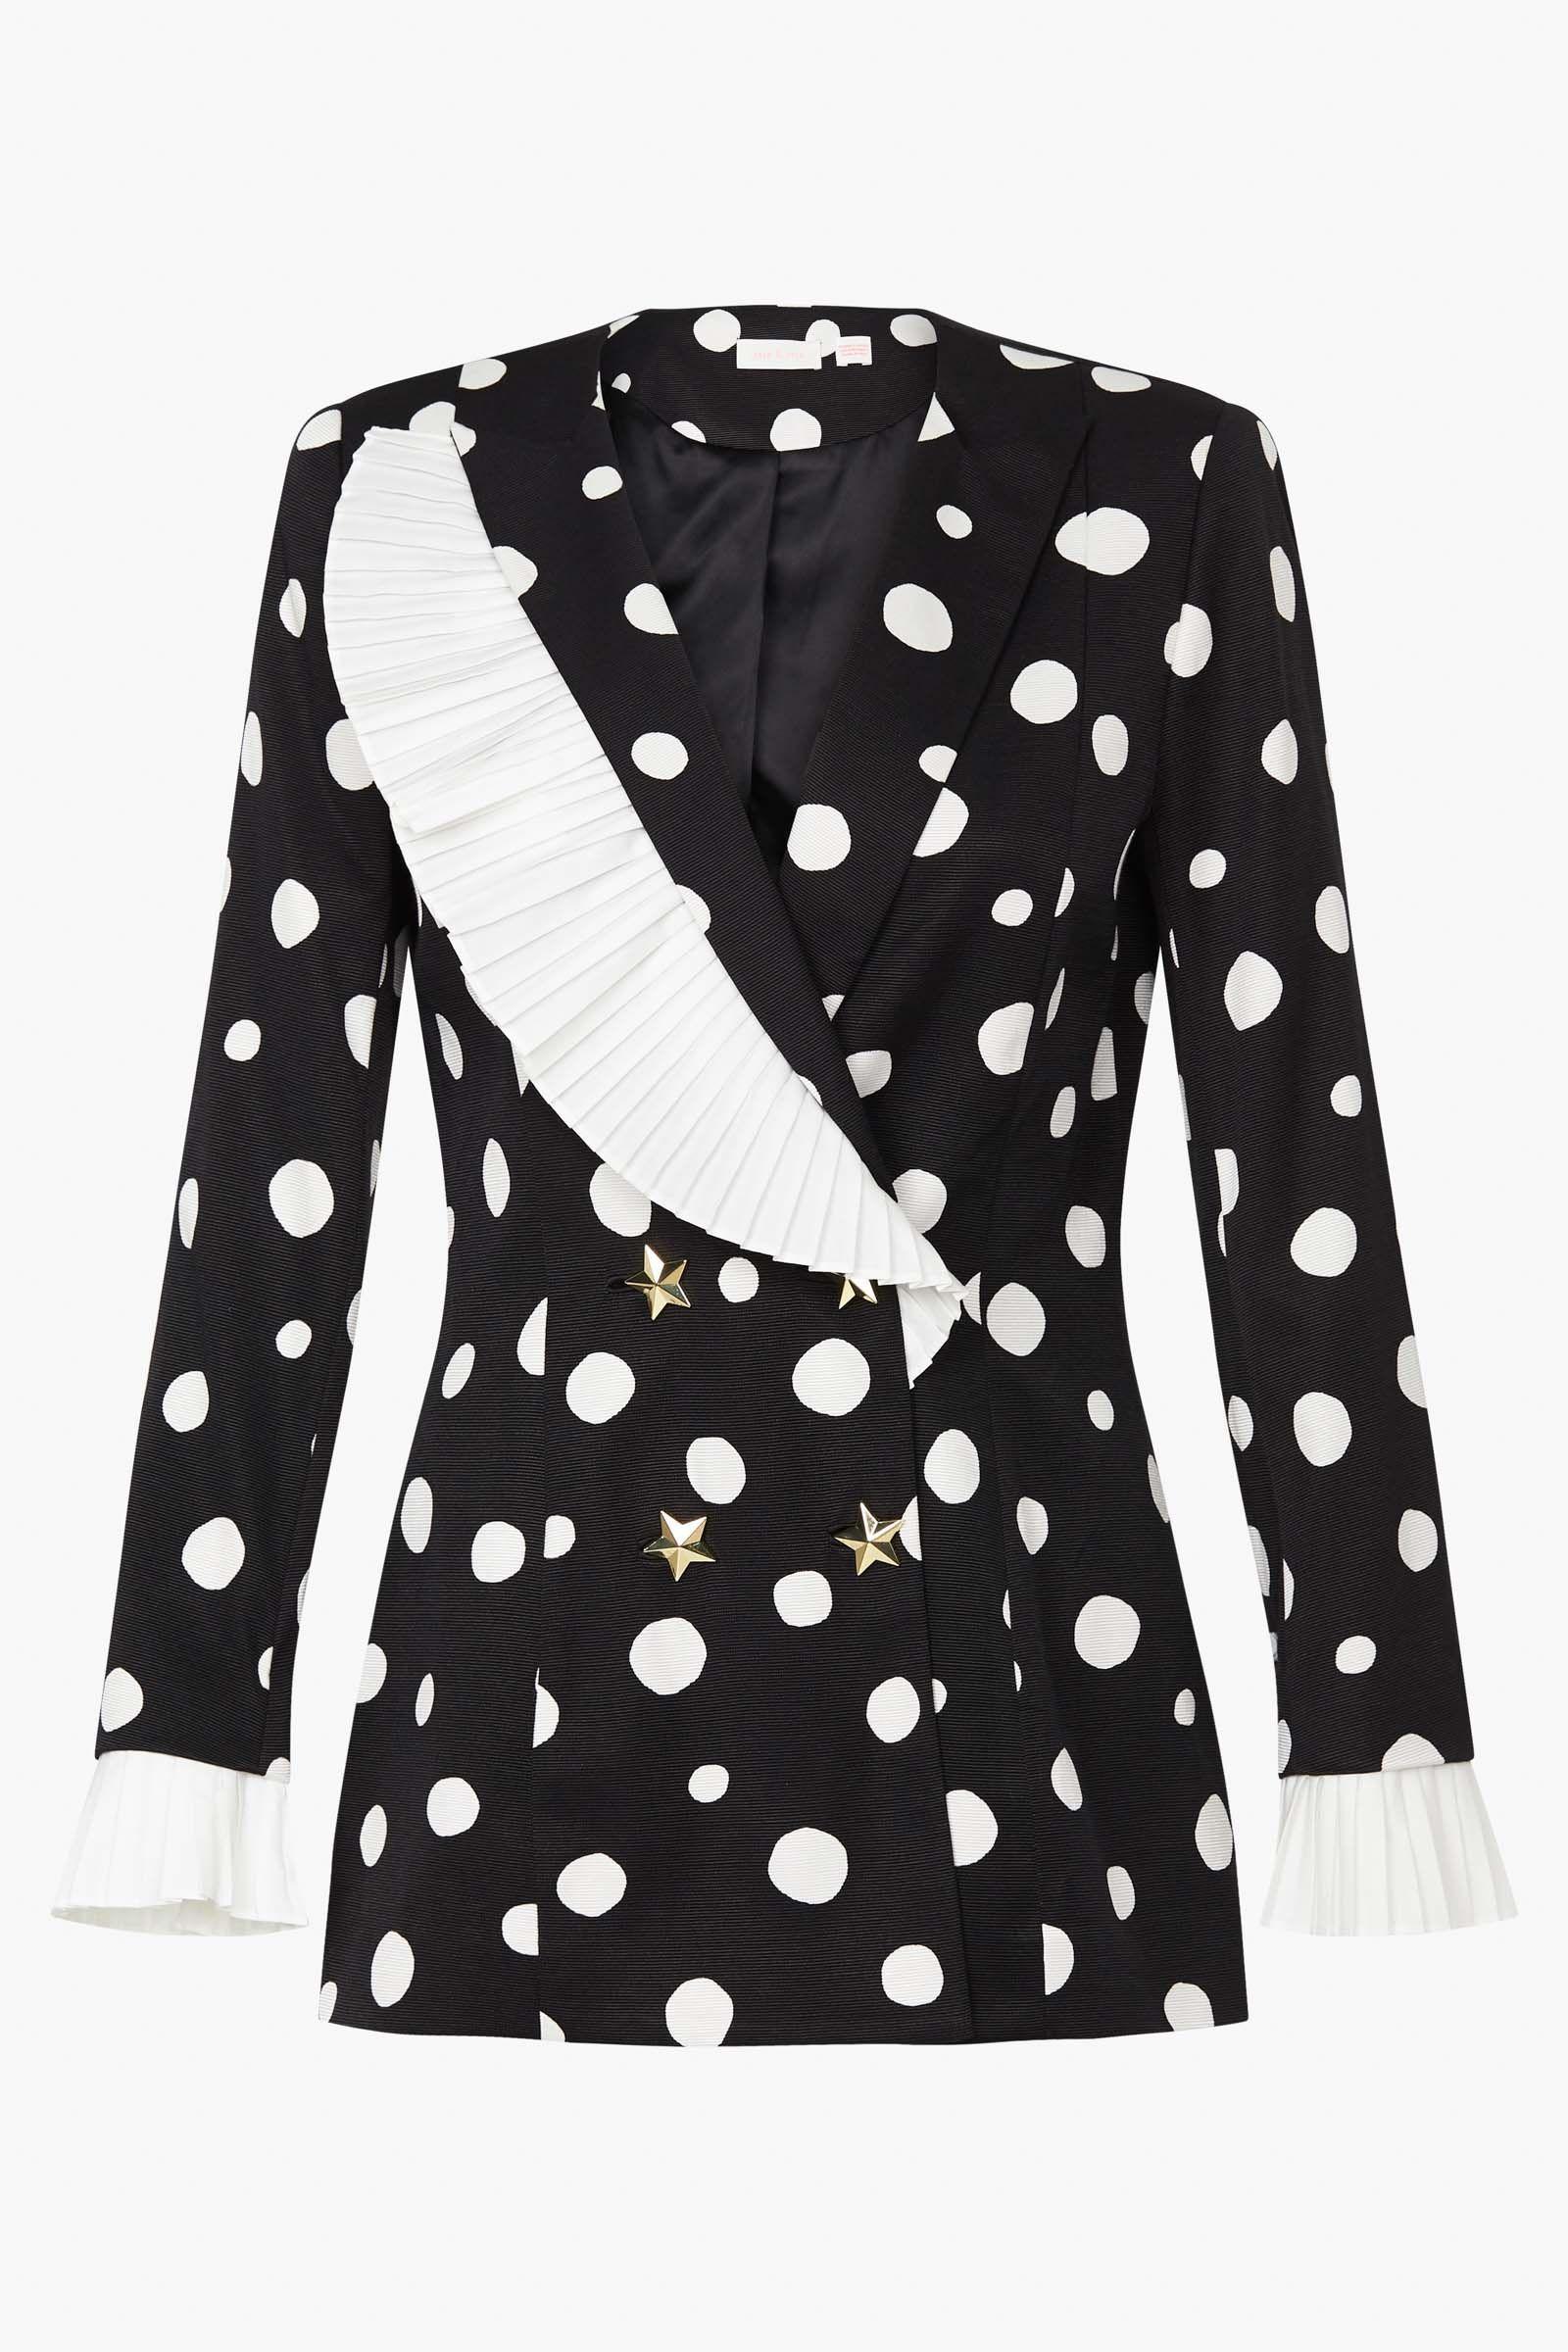 La Vagabonde Jacket Sass Bide Tailored Blazer Sassandbide Jackets Flare Maxi Skirt Frill Tops